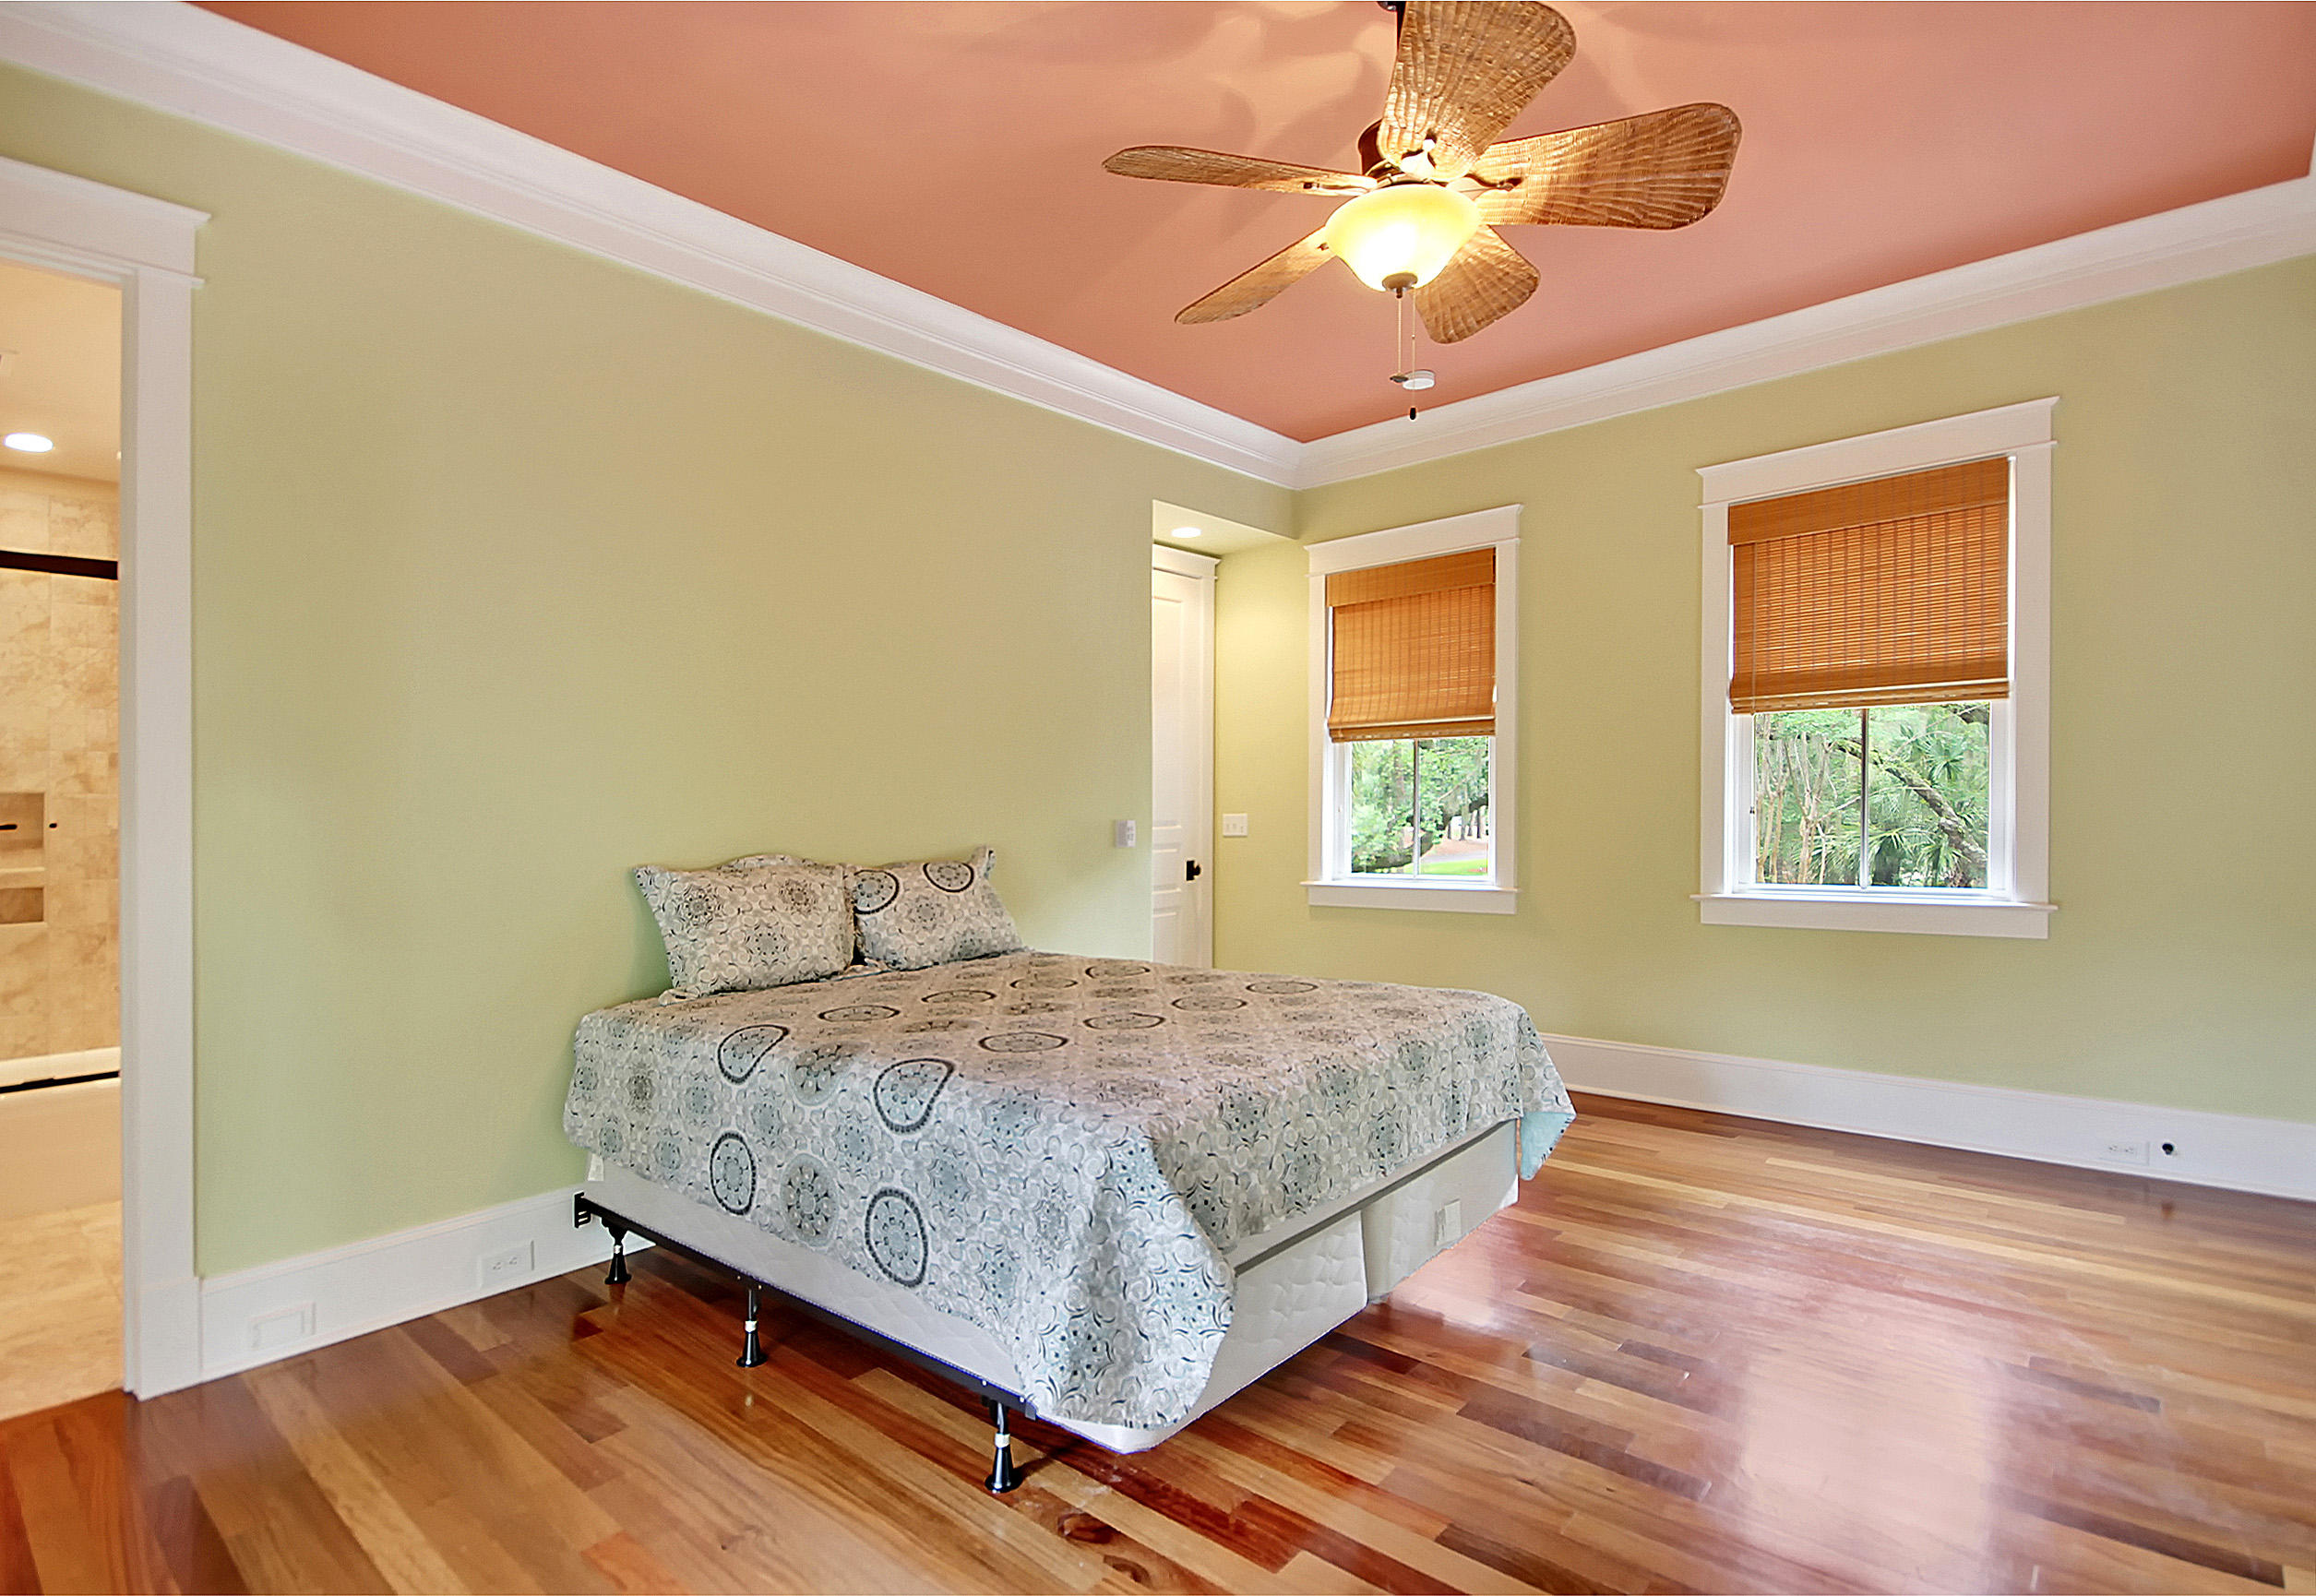 Seabrook Island Homes For Sale - 3278 Privateer Creek, Seabrook Island, SC - 12